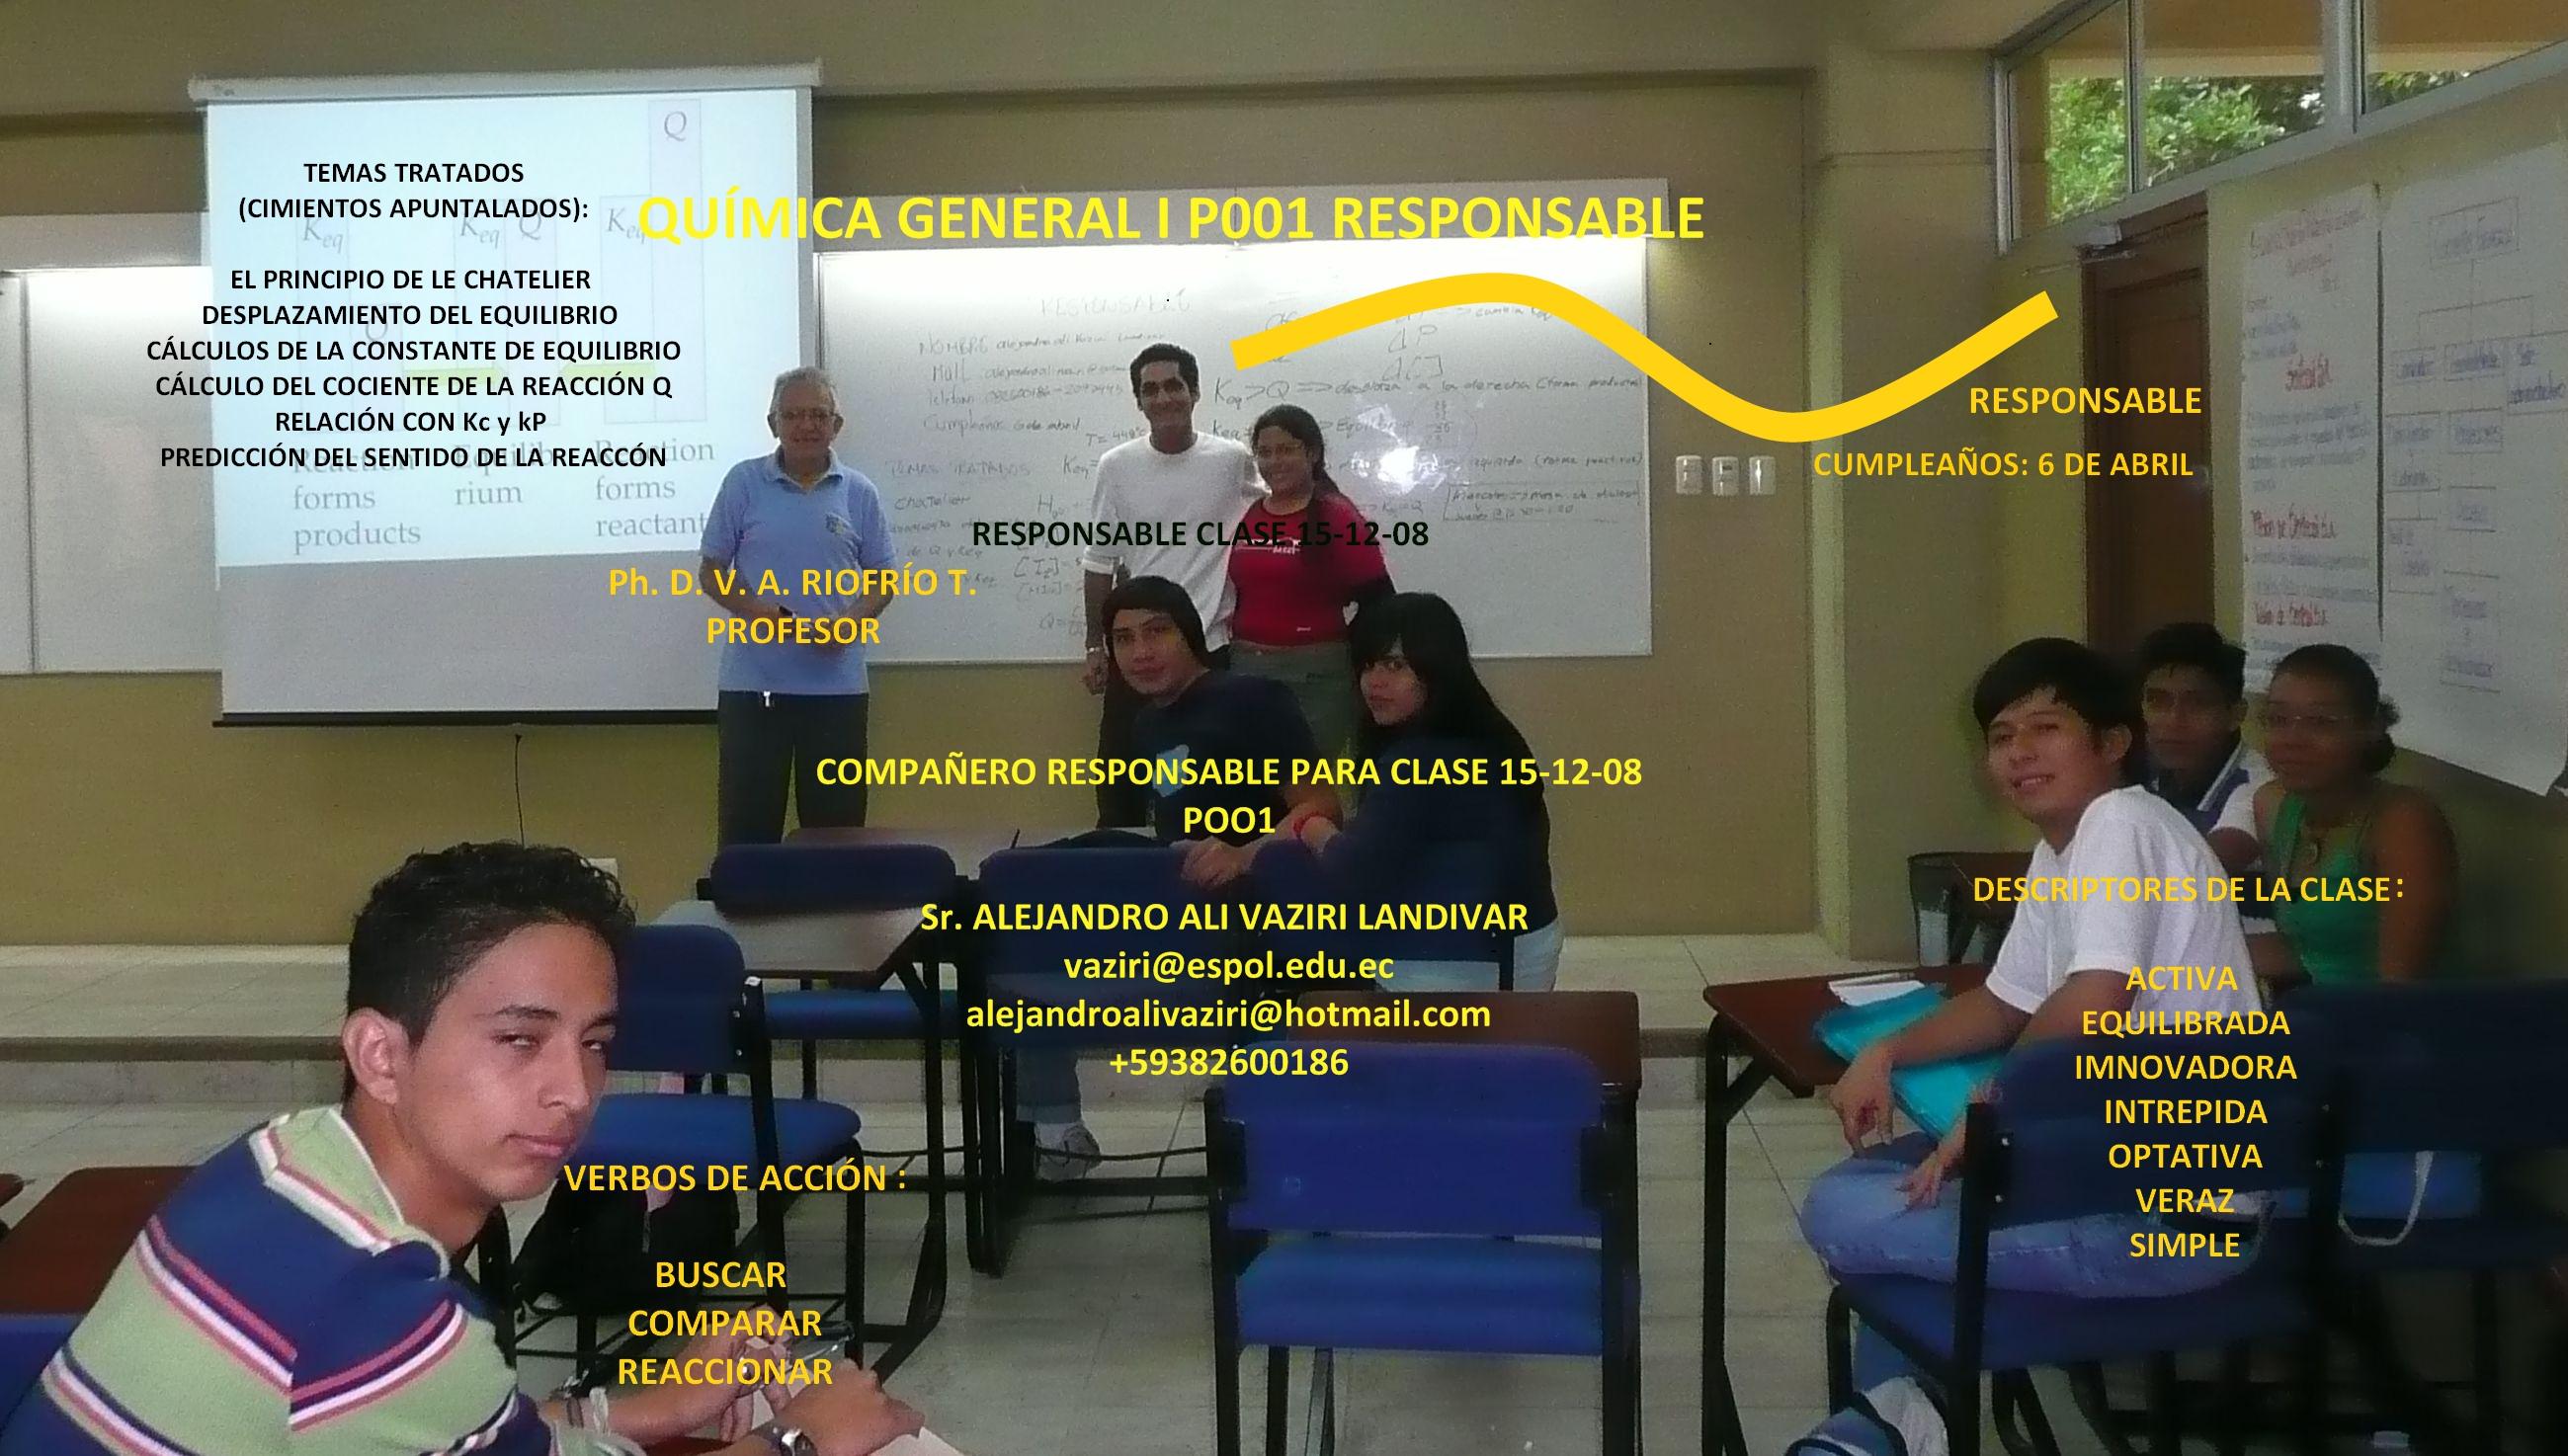 COMPAÑERO RESPONSABLE PARA CLASE 15-12- 08 / Sr. ALEJANDRO VAZIRI